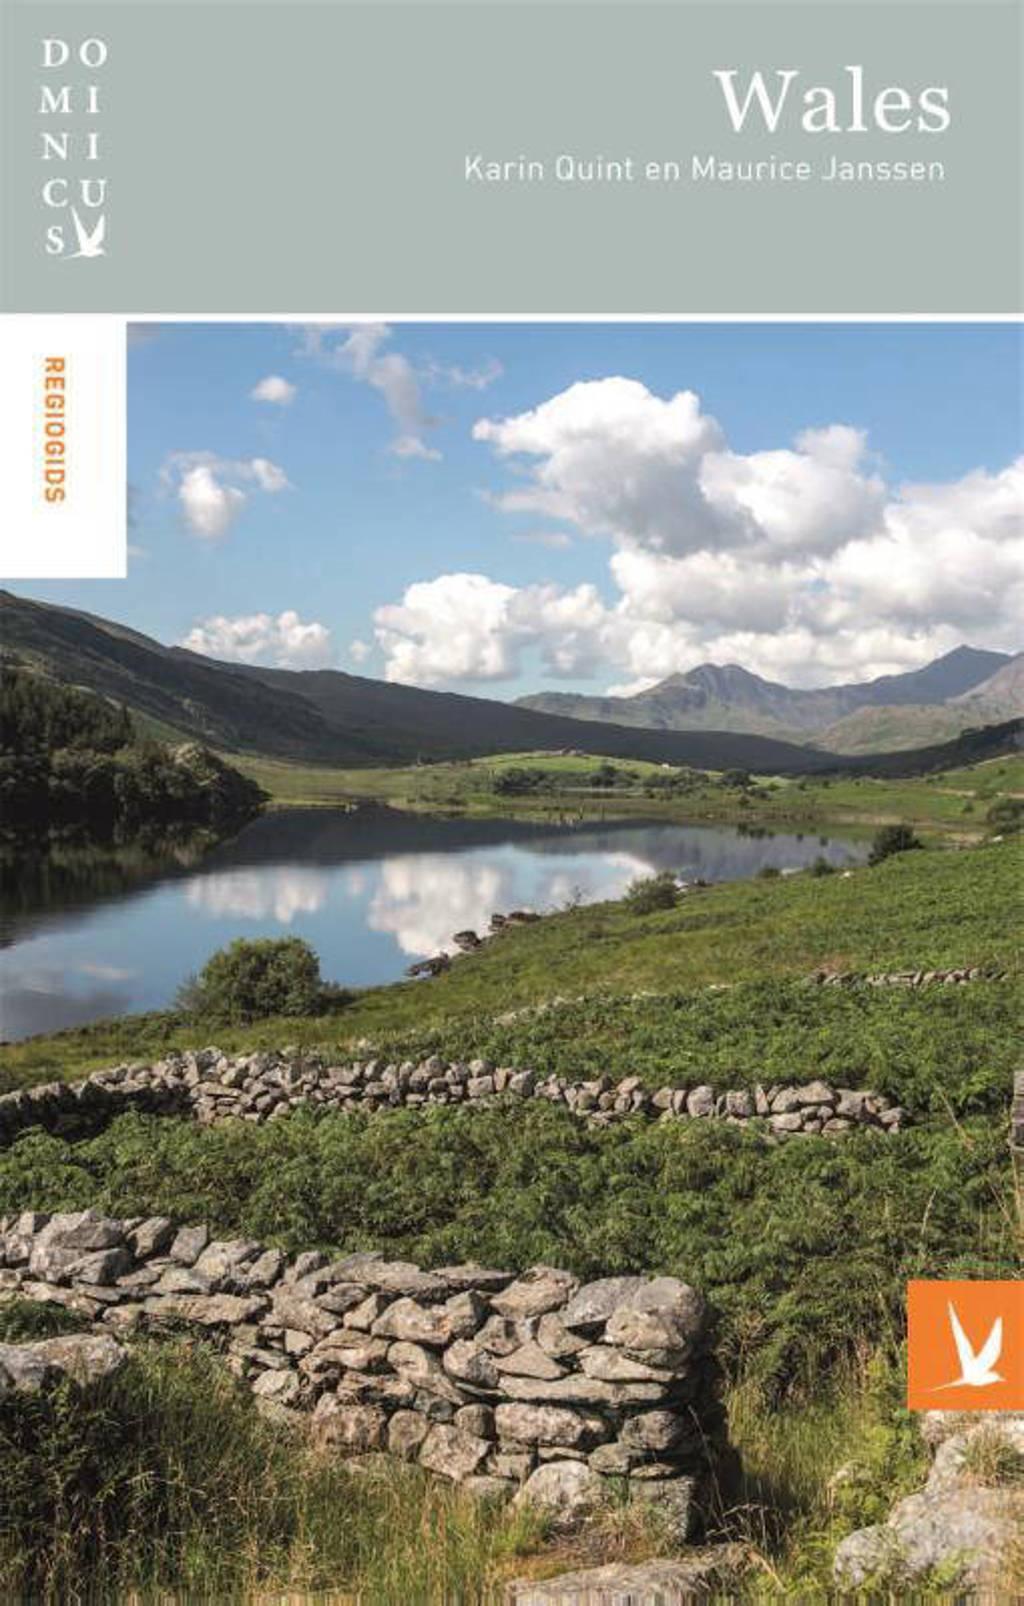 Dominicus Regiogids: Wales - Karin Quint en Maurice Janssen